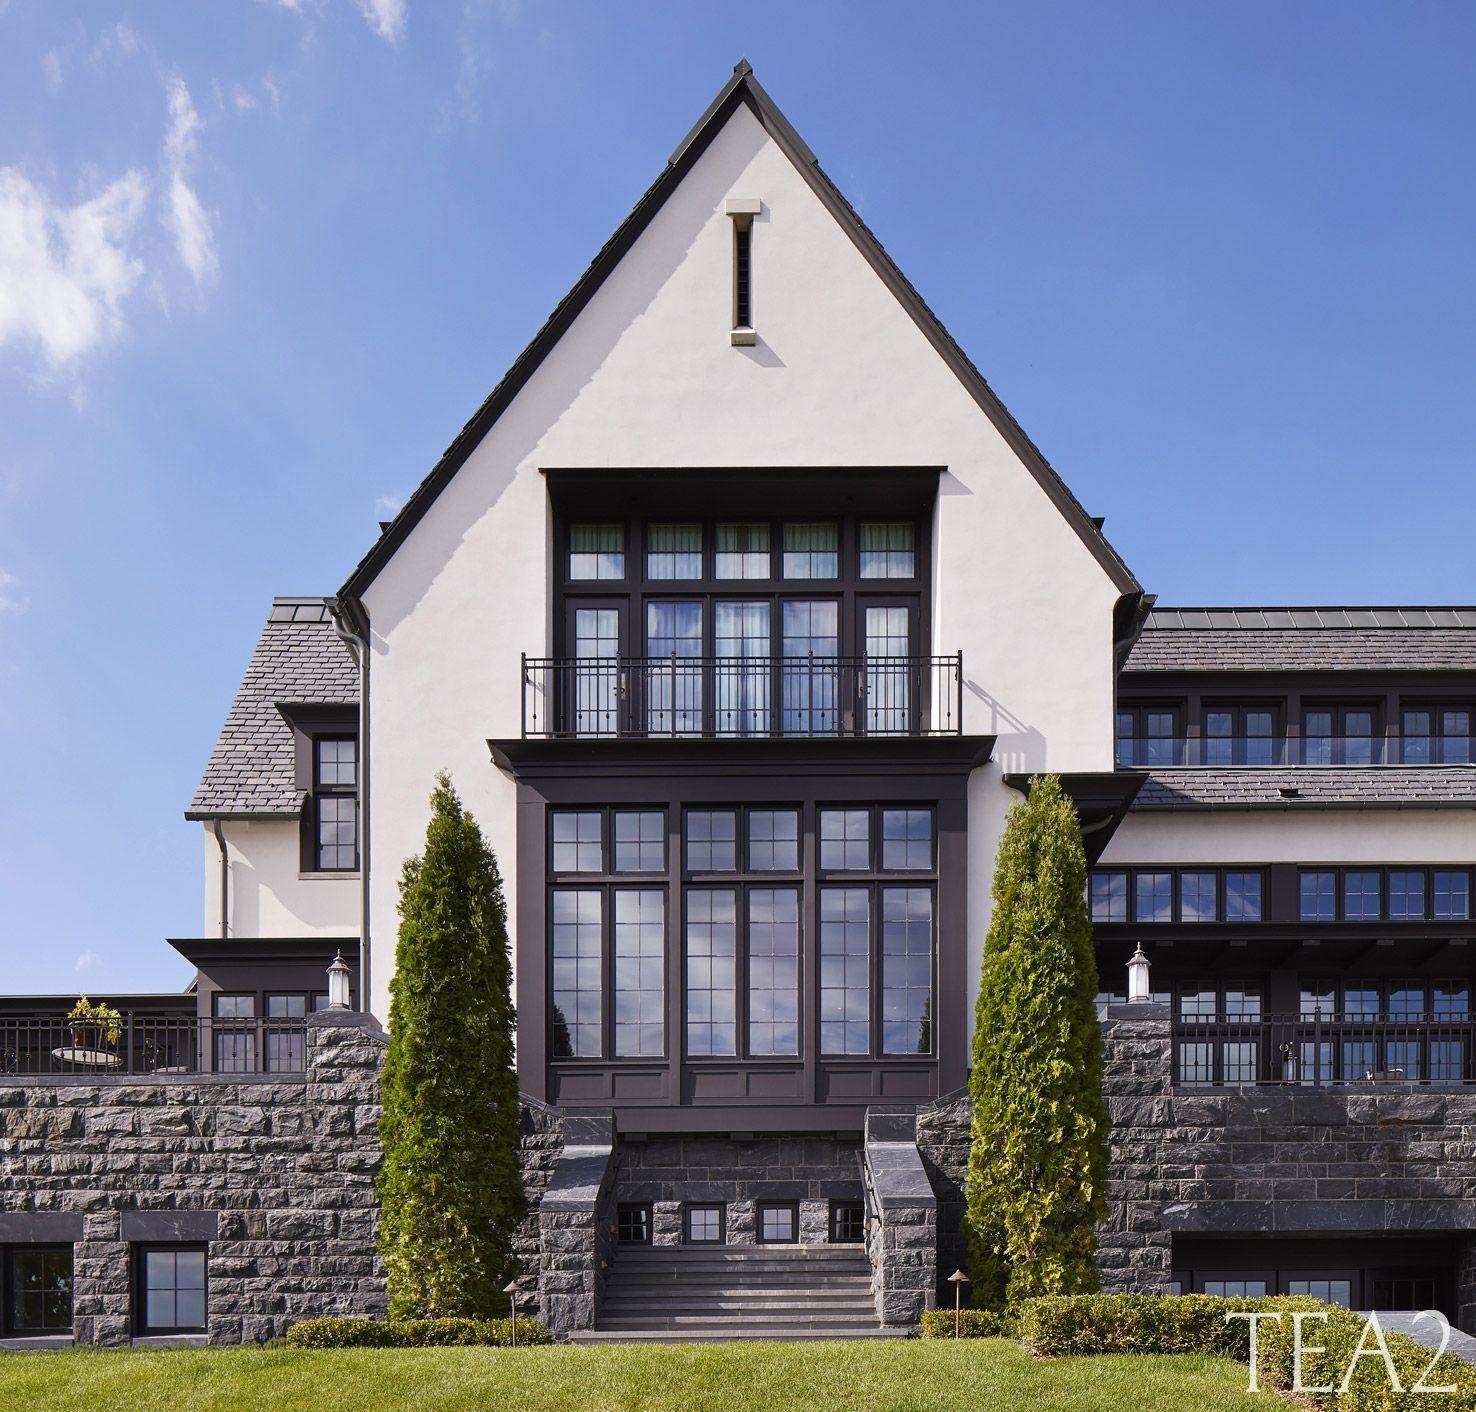 From the Portfolio of TEA2 Architects Arquitectura